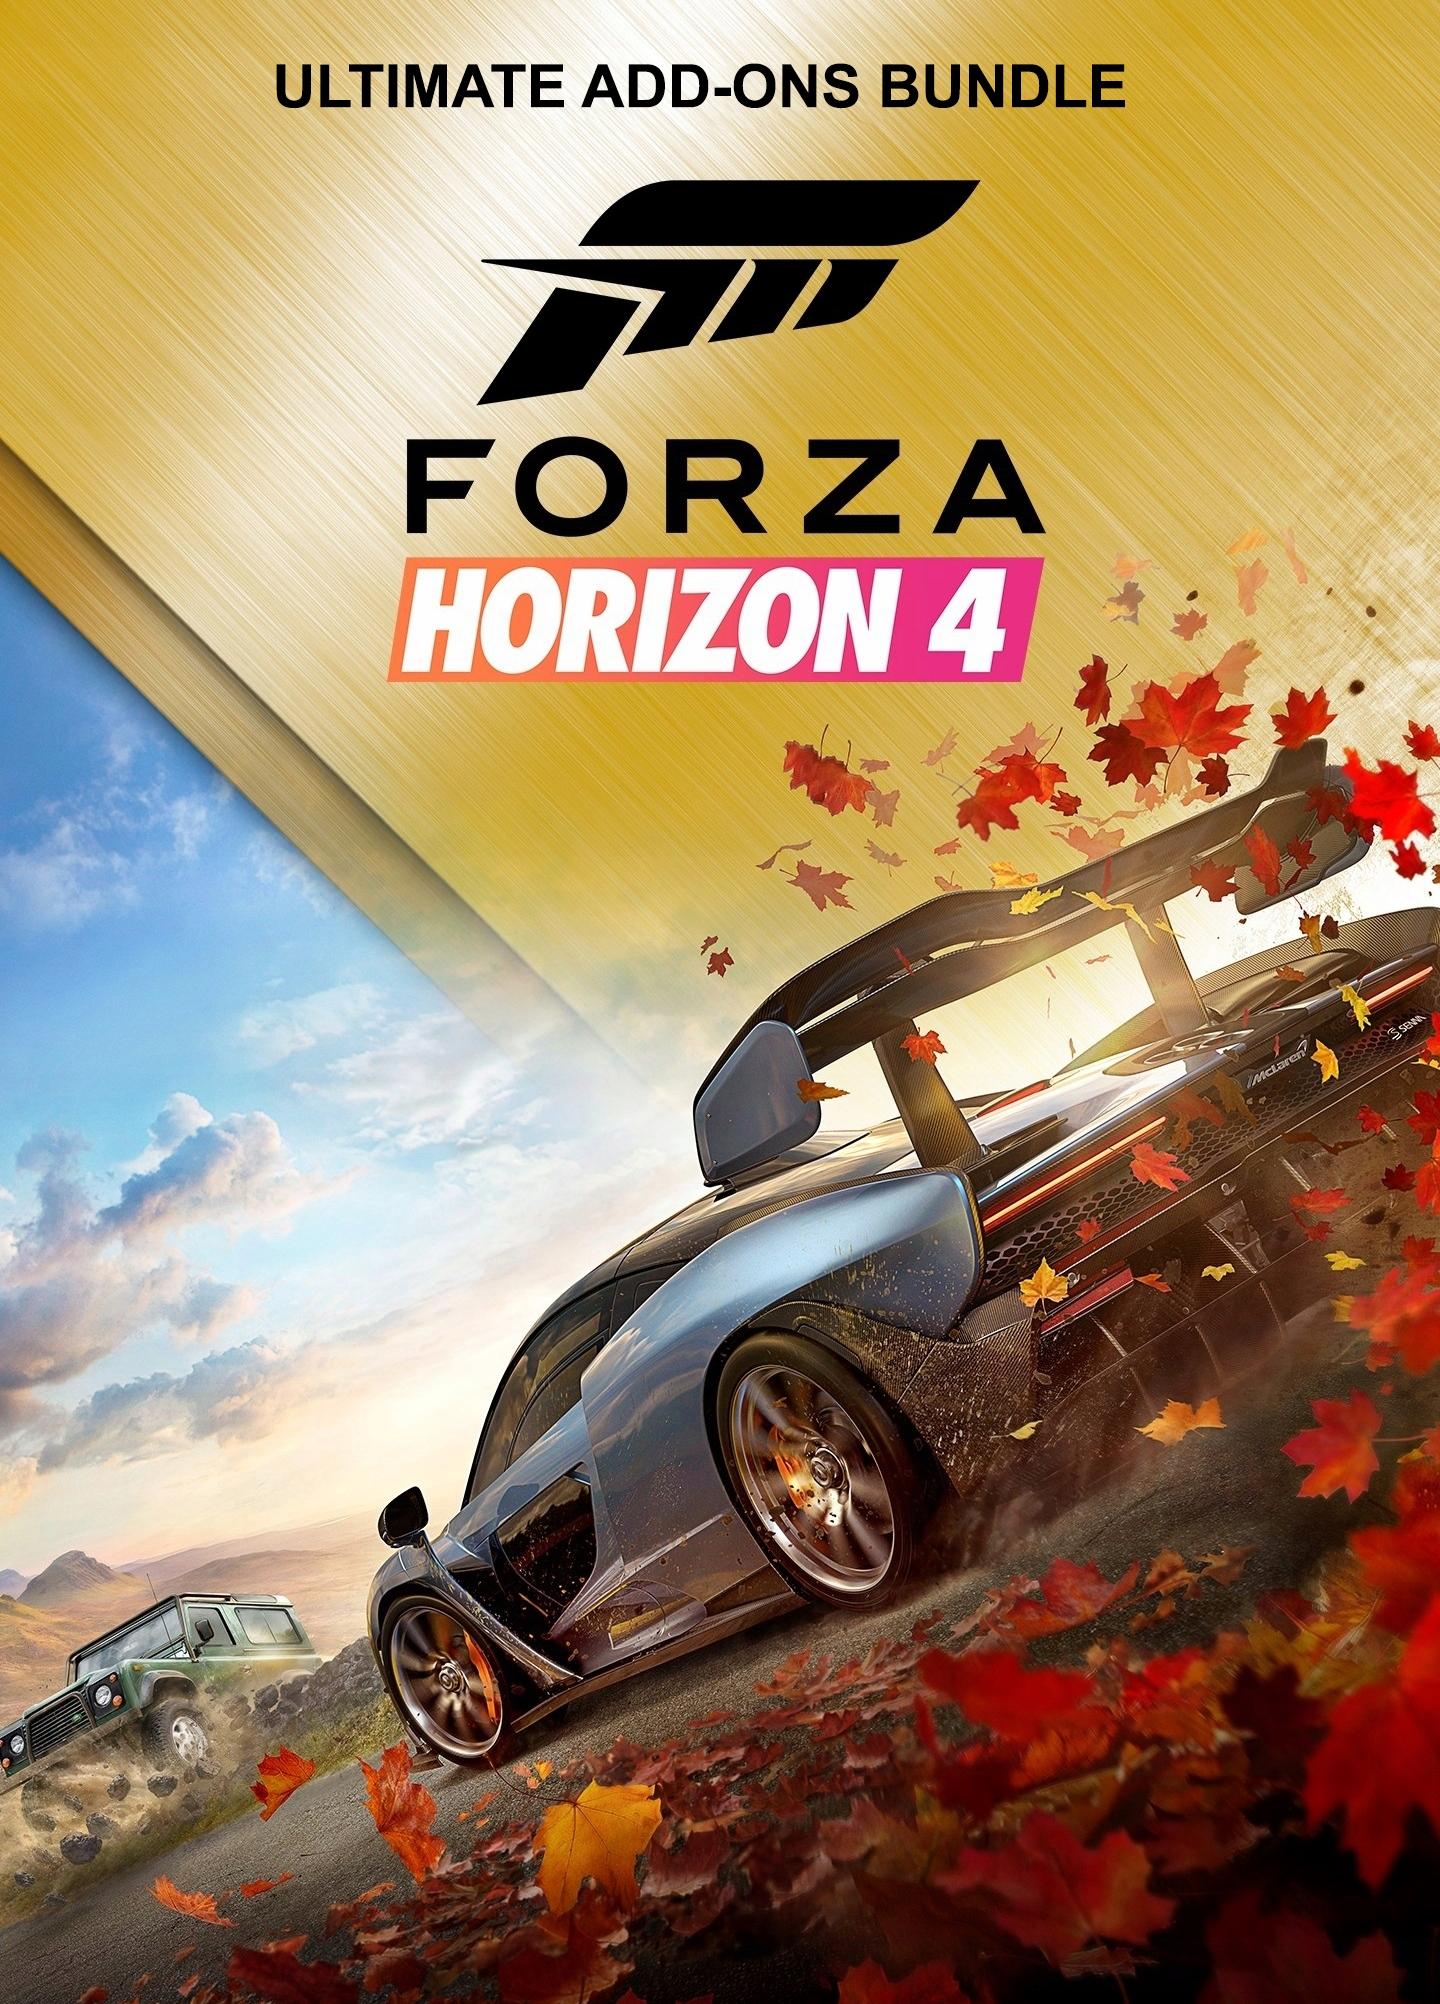 Bundle Forza Horizon 4 – Ultimate Add Ons für Xbox One - Series X S & PC Windows 10 (Microsoft Store Brazil)